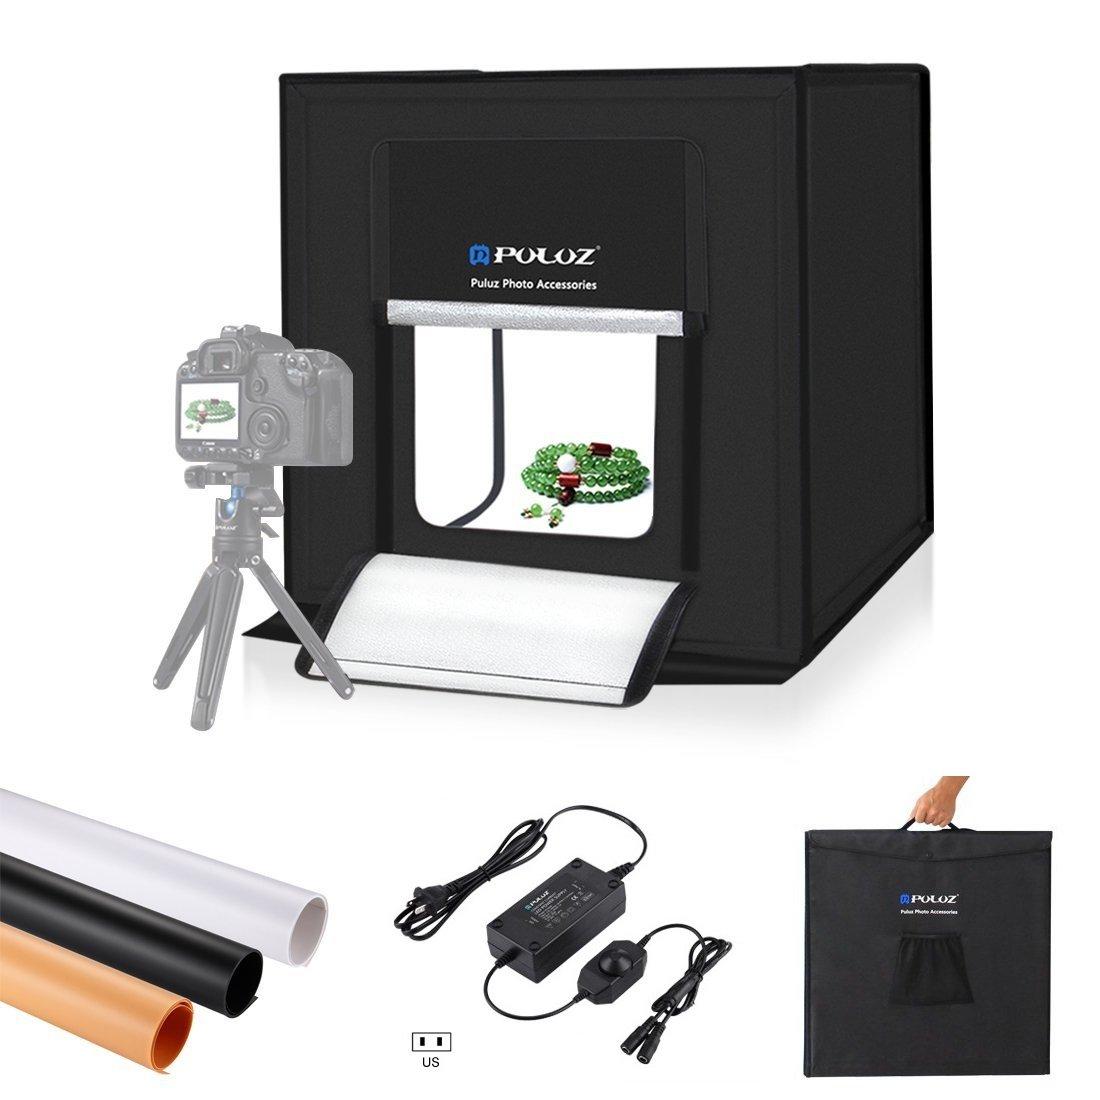 Mini Photo Studio Box, PULUZ 20cm Portable Photography Shooting Light Tent Kit, White Folding Lighting Softbox with 20 LED Lights + 6 Backdrops for Product Display PU5021